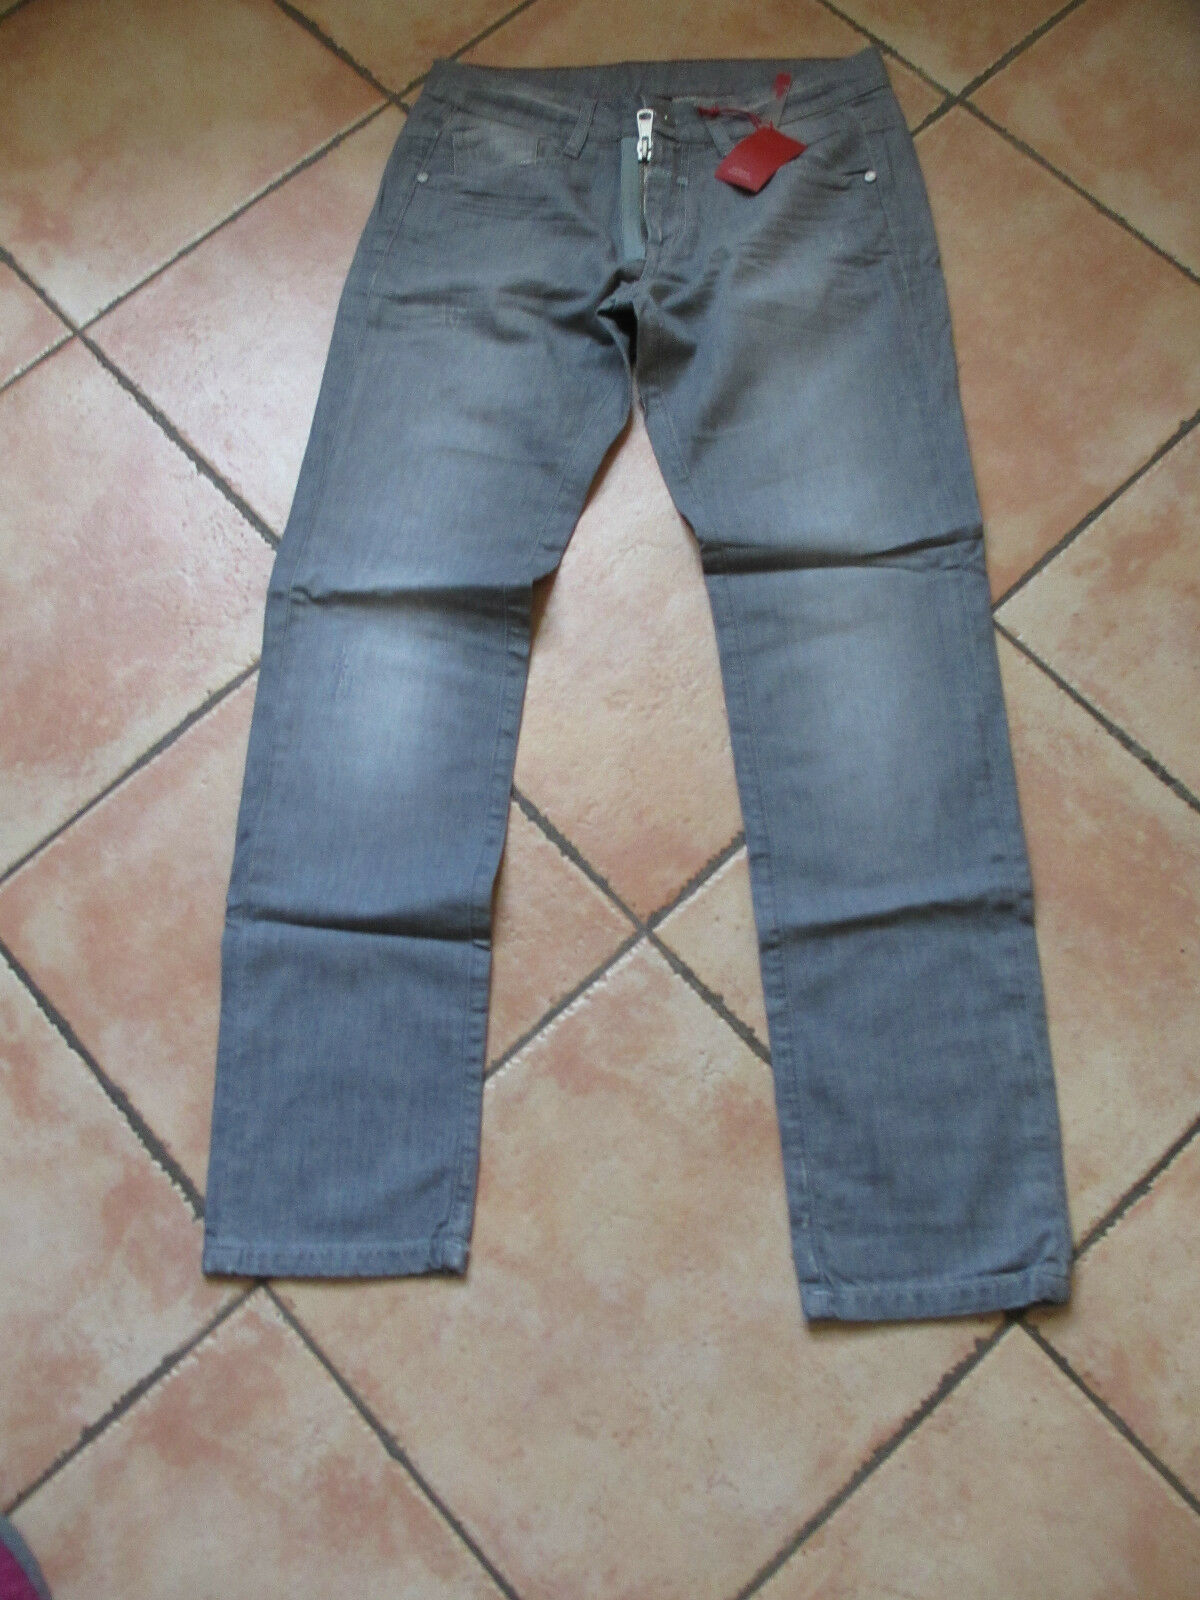 NEUF NEUF NEUF ce jean grigio M§F GIRBAUD,Dimensione 38 F 2e1653